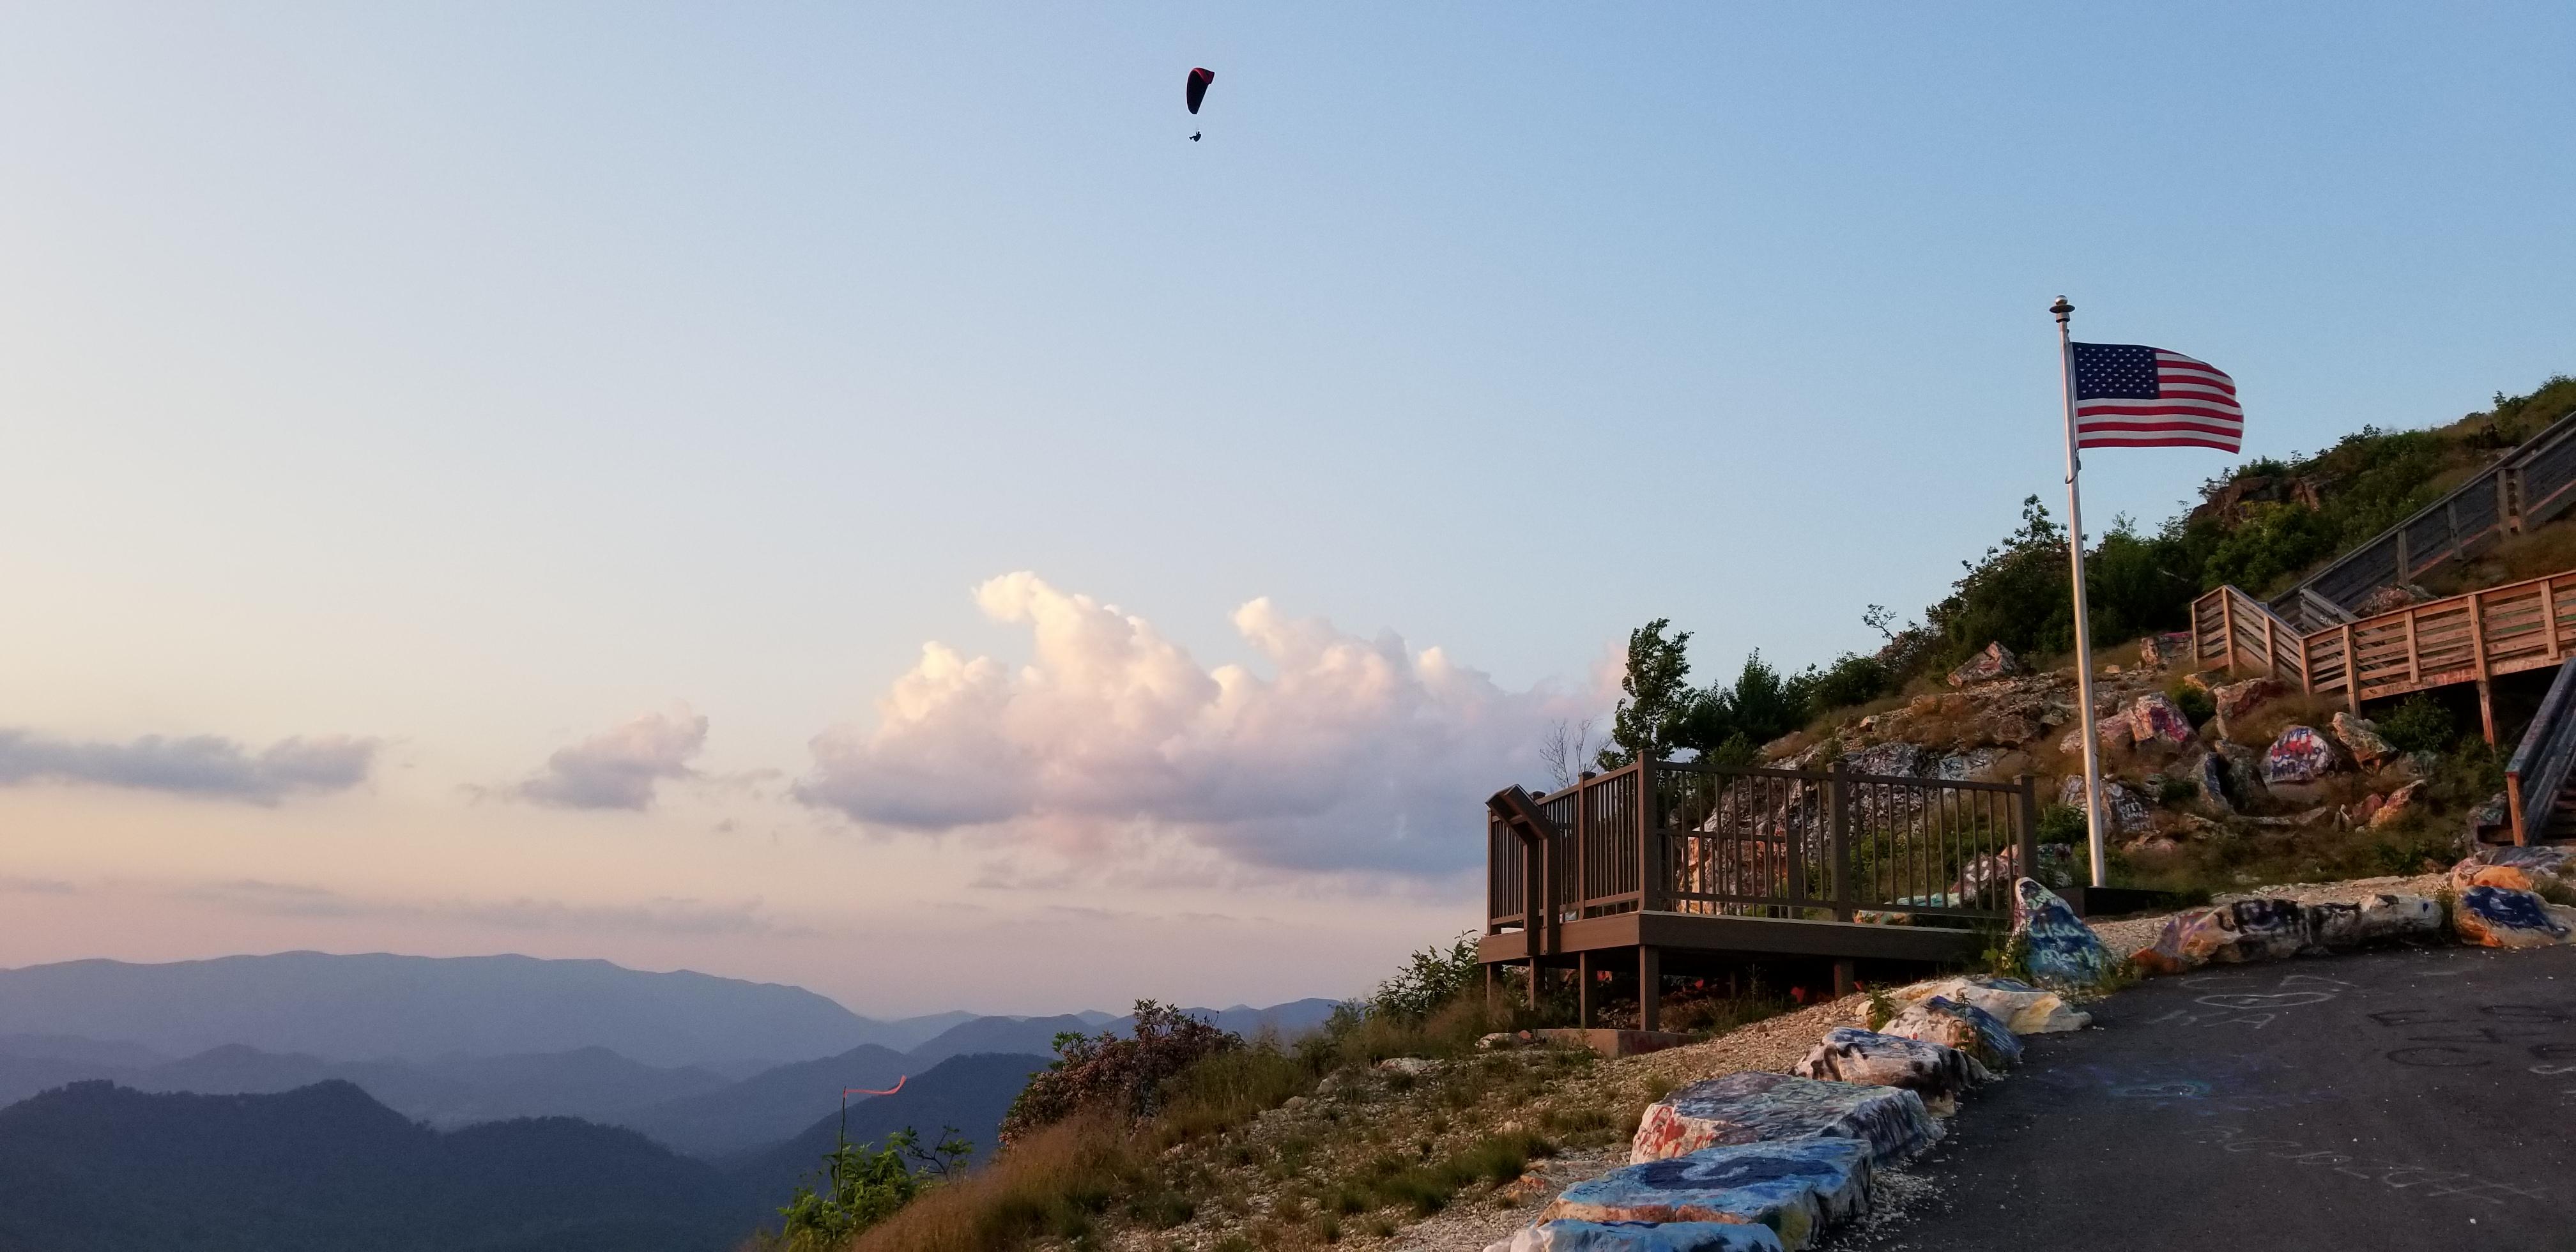 A paraglider sailing over a blue dusk sky.